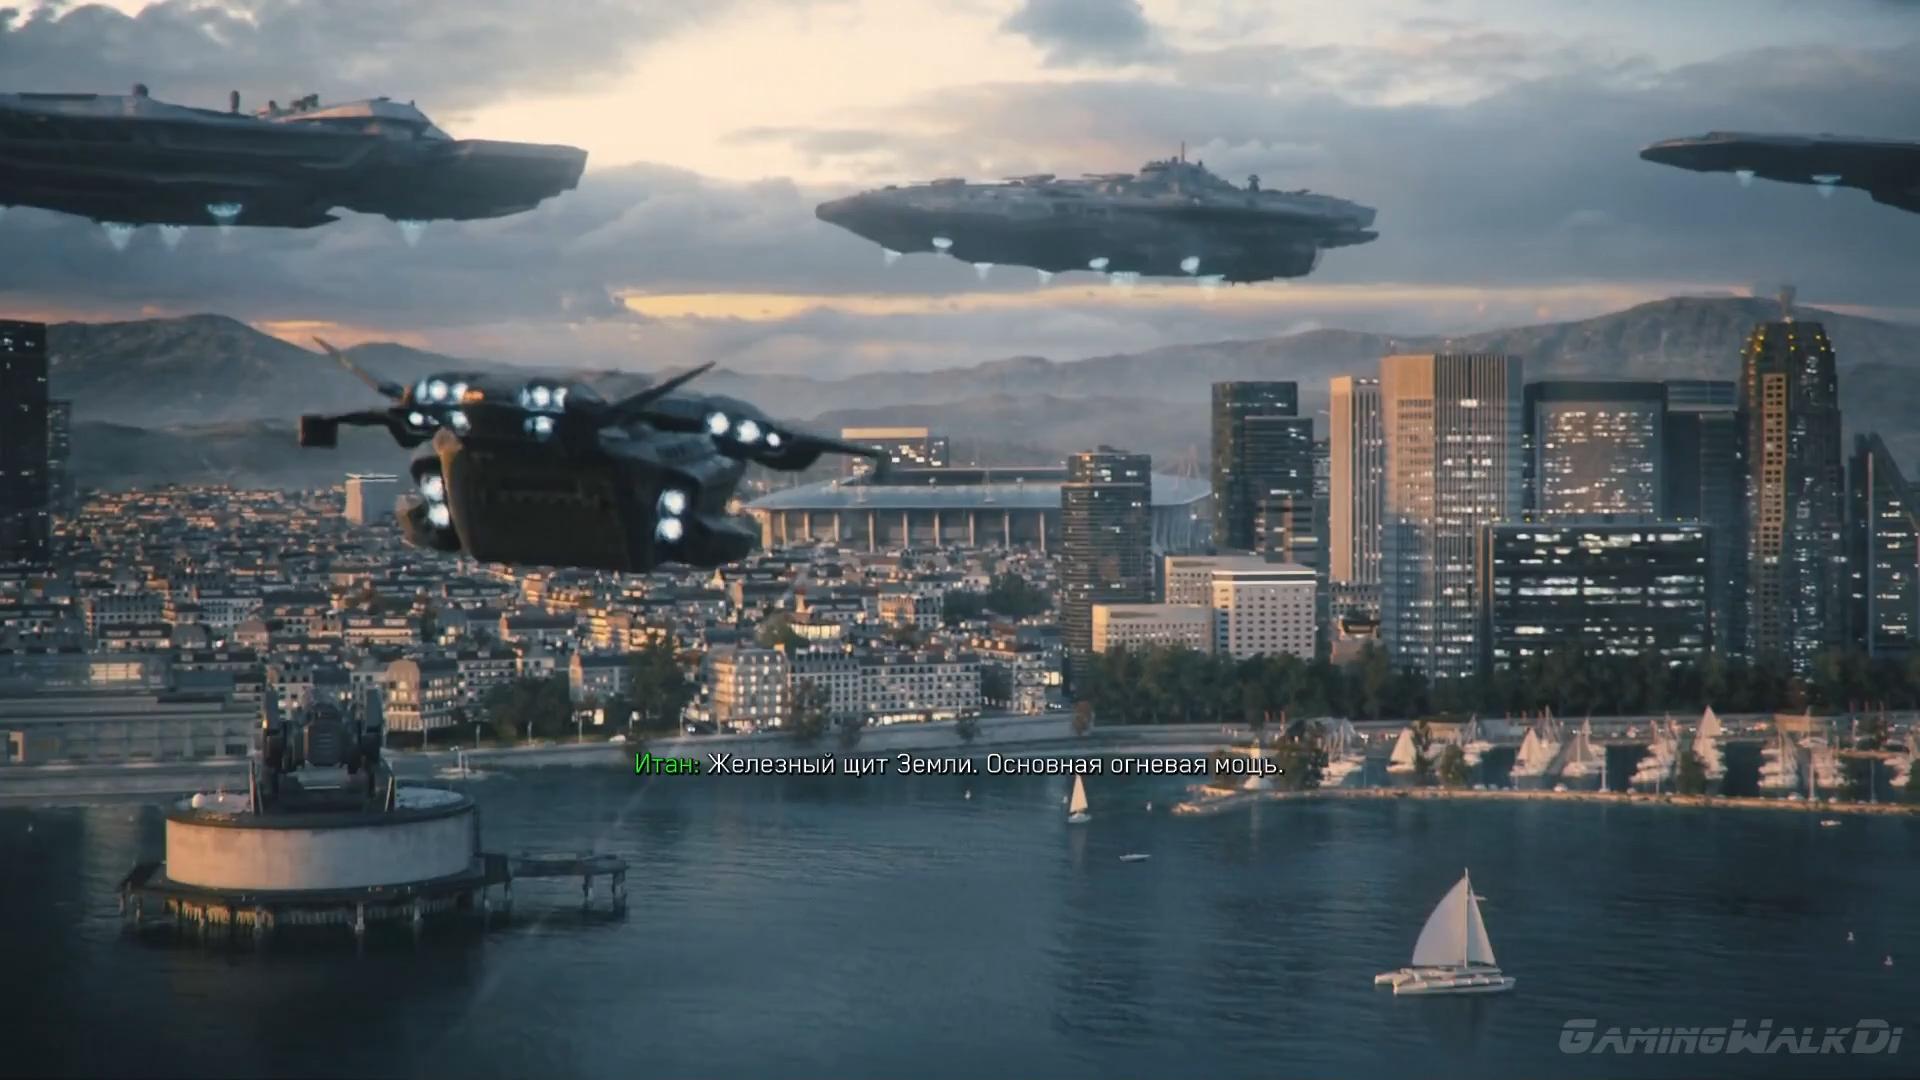 Call of Duty: Infinite Warfare | WEBRip 1080p | D